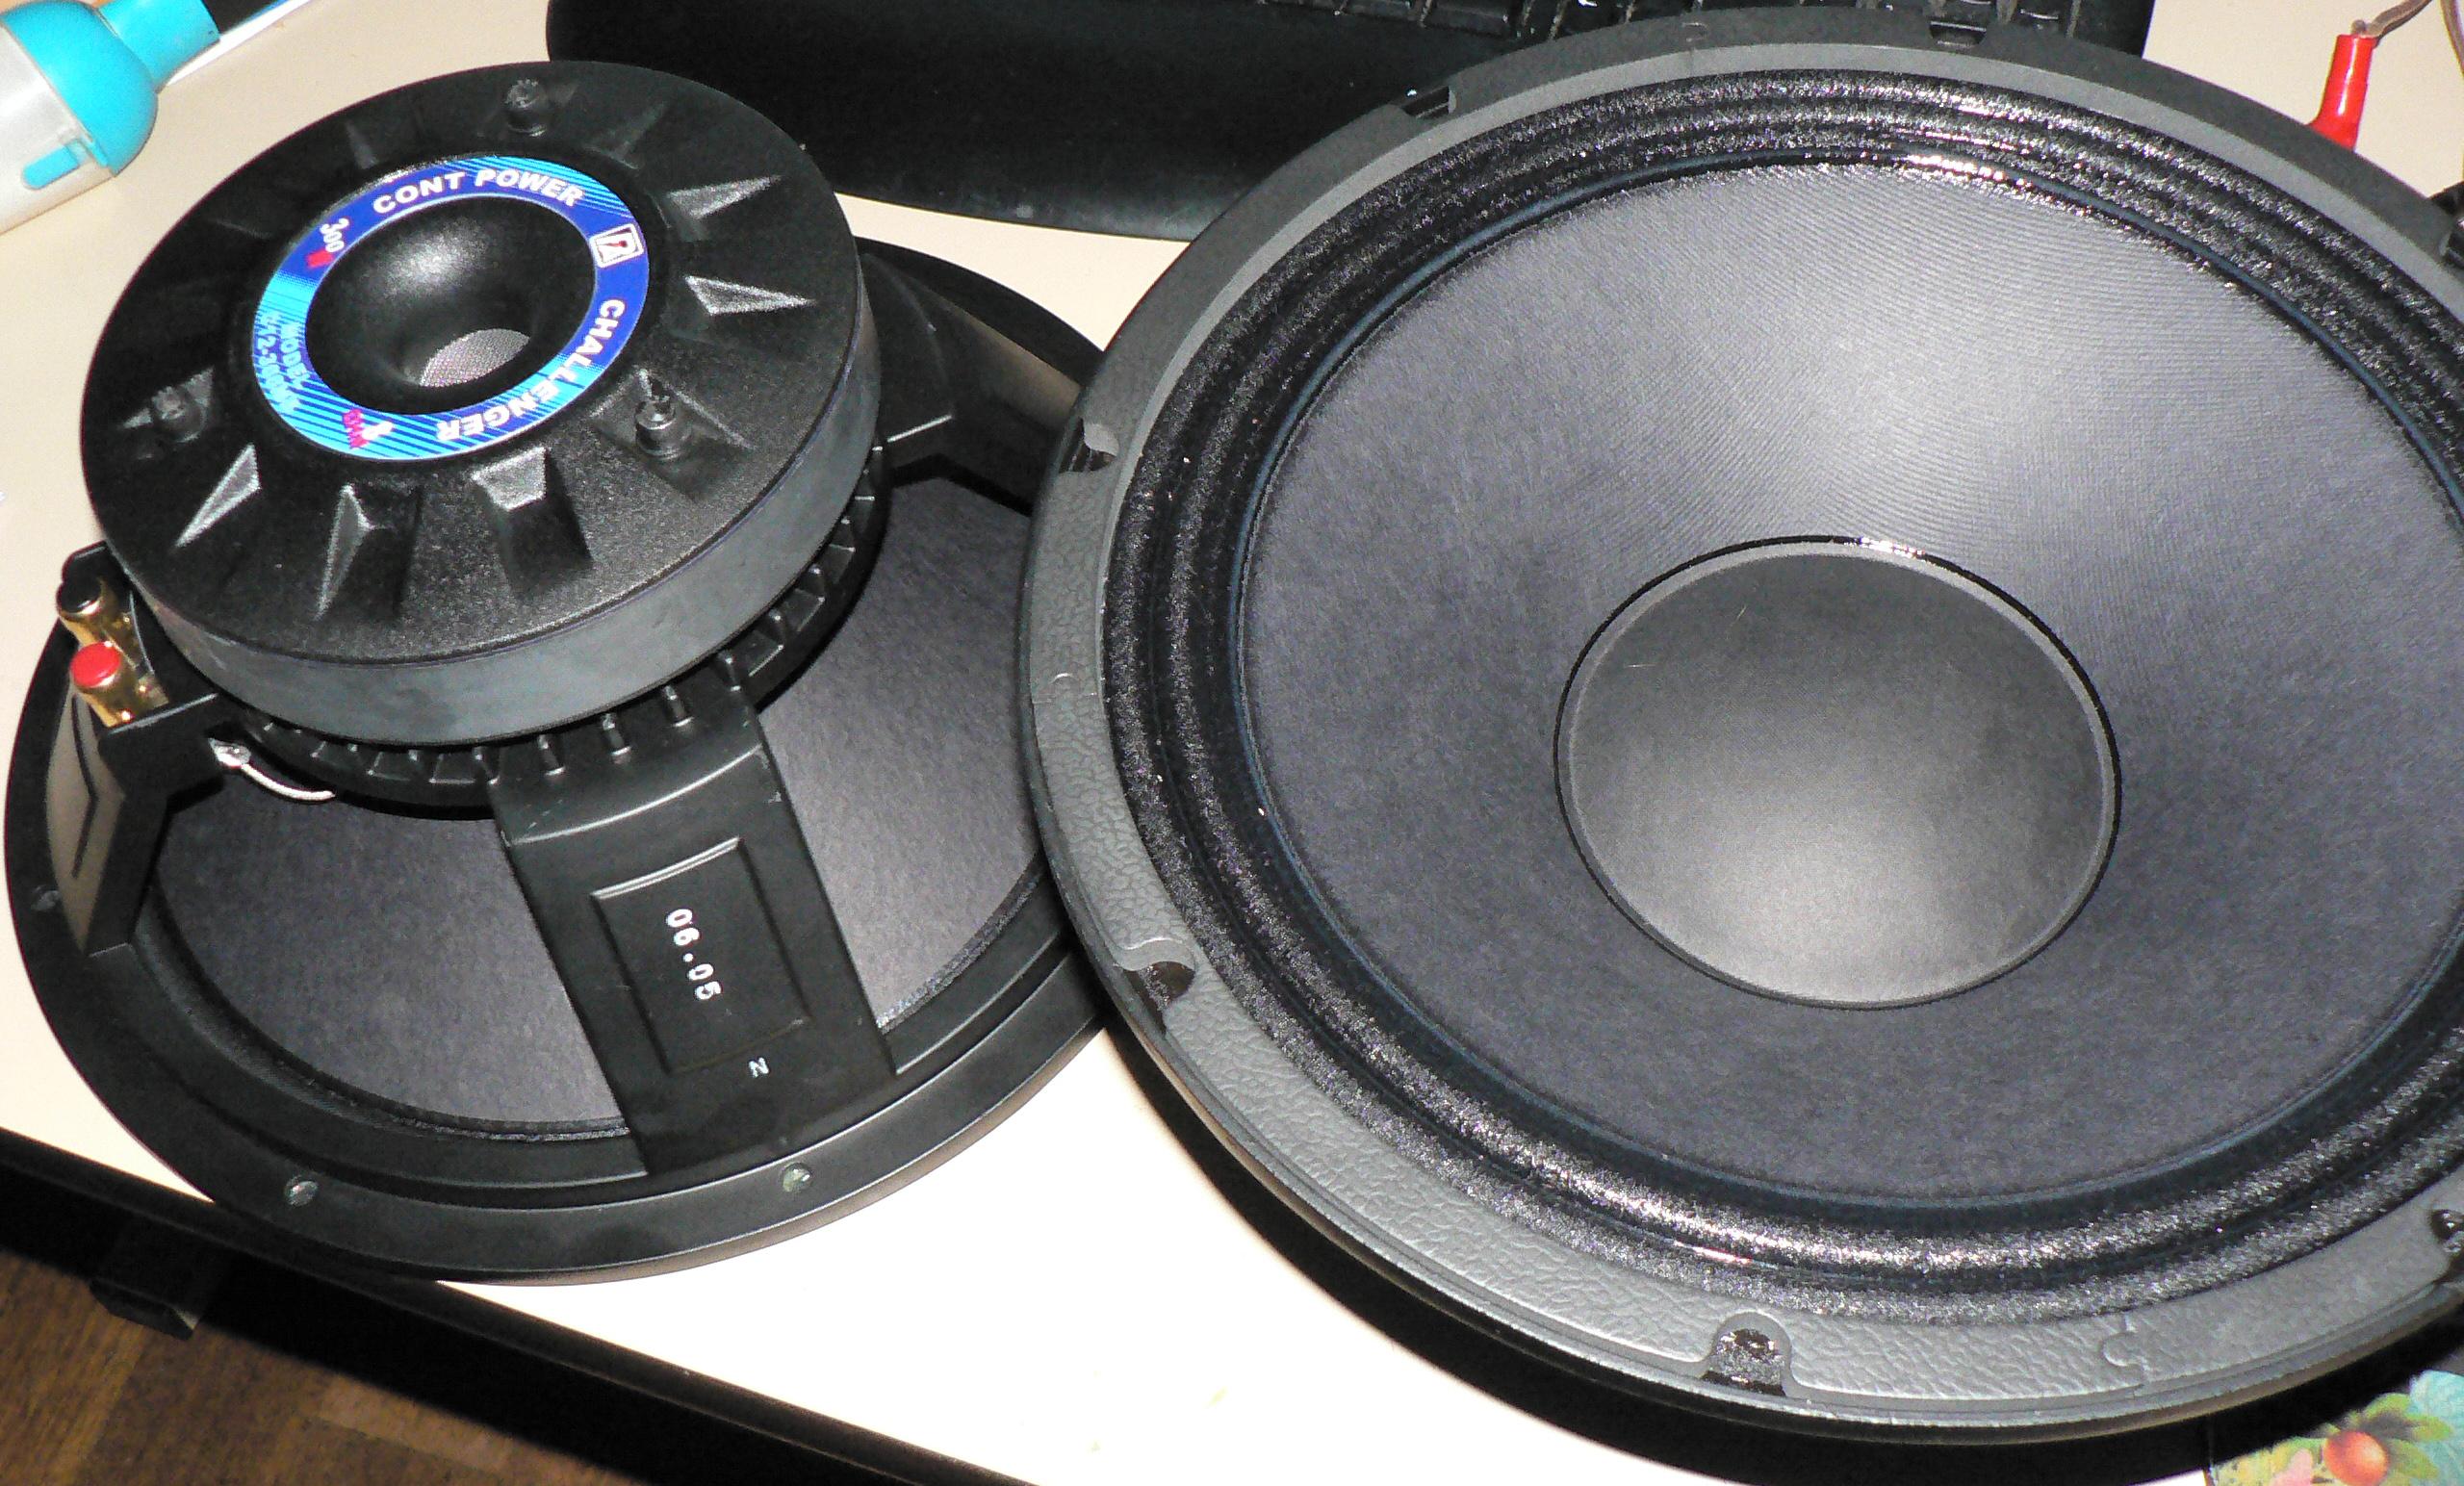 Electrodynamic speaker driver - Wikipedia